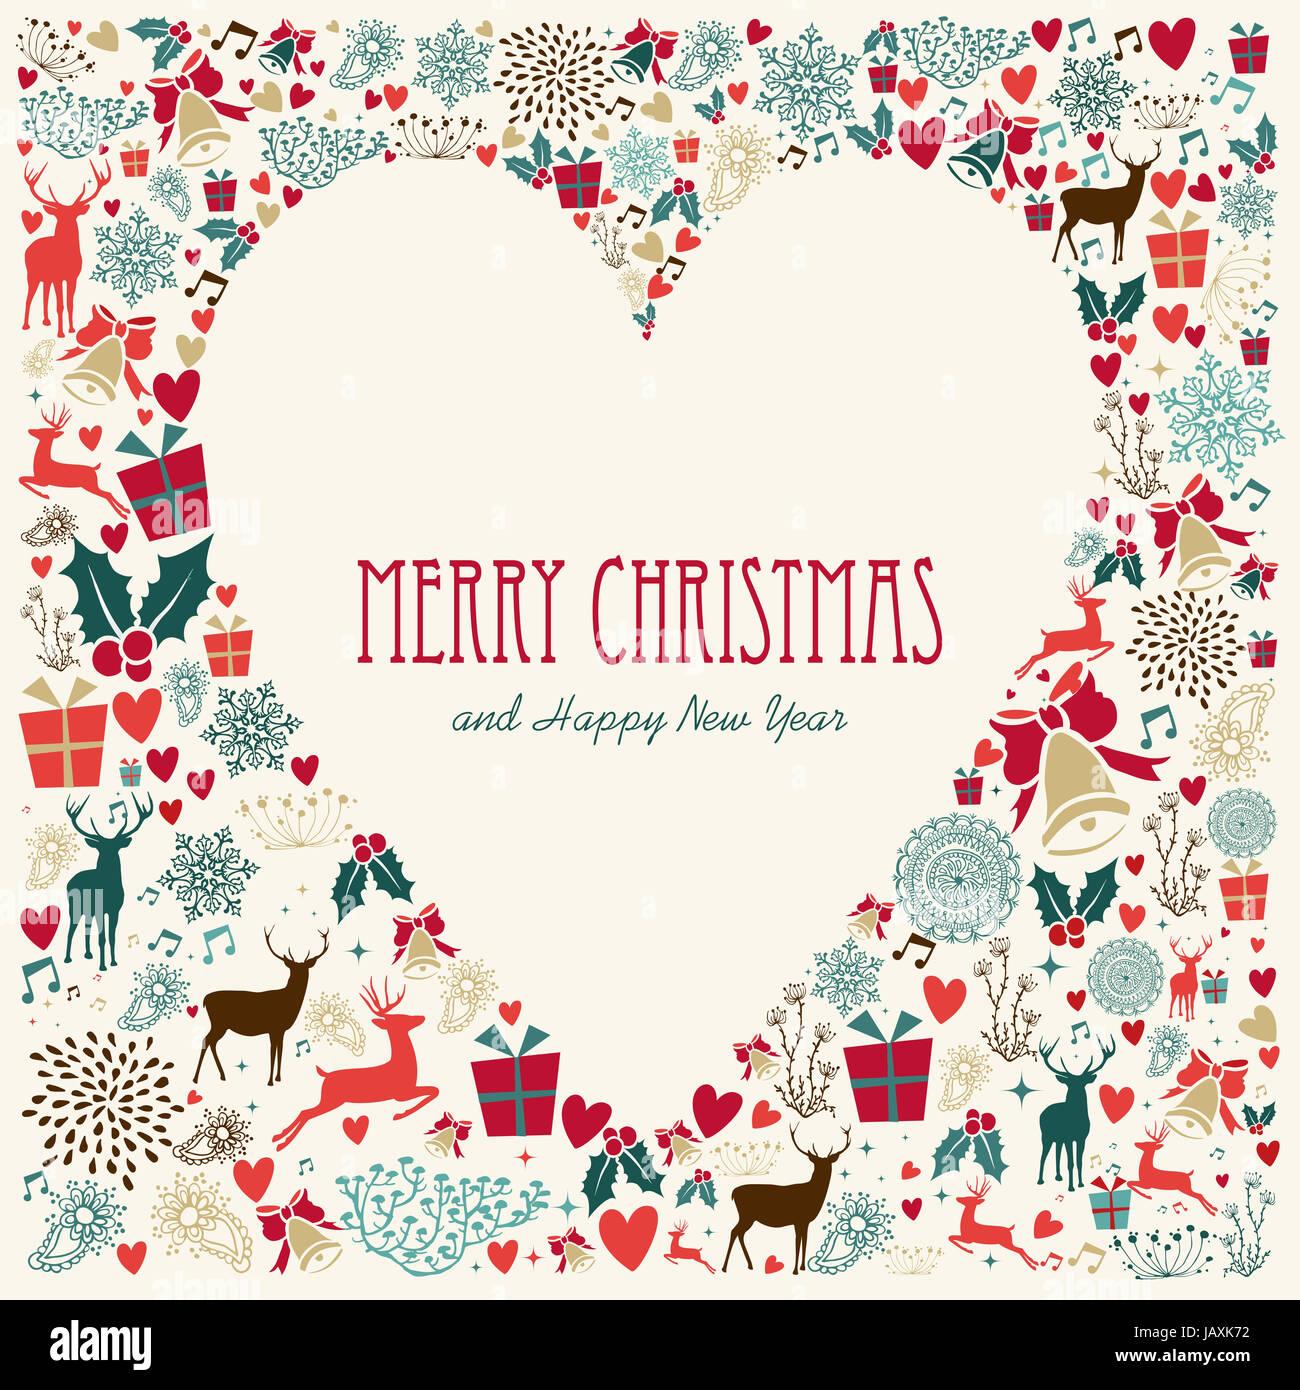 Christmas Heart Vector.Vintage Christmas Heart Love Elements Background Eps10